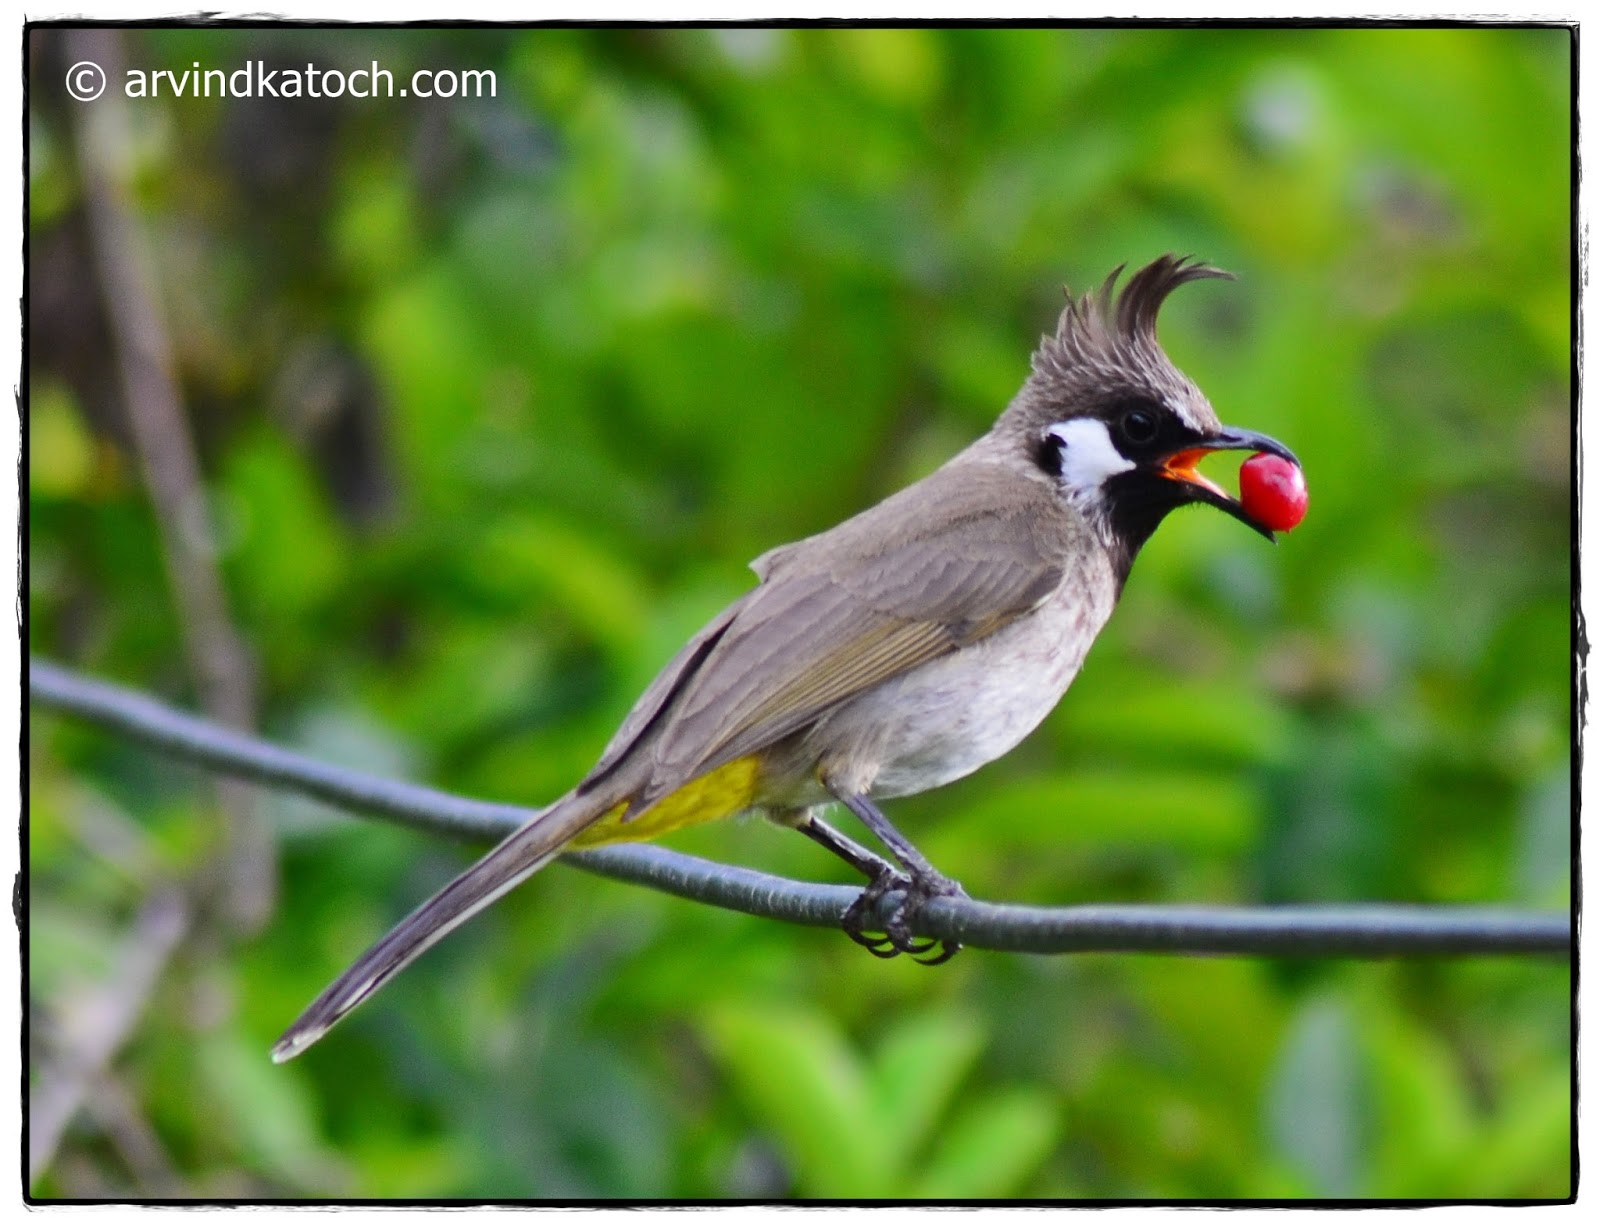 The Himalayan Bulbul Pycnonotus Leucogenys Or Or White